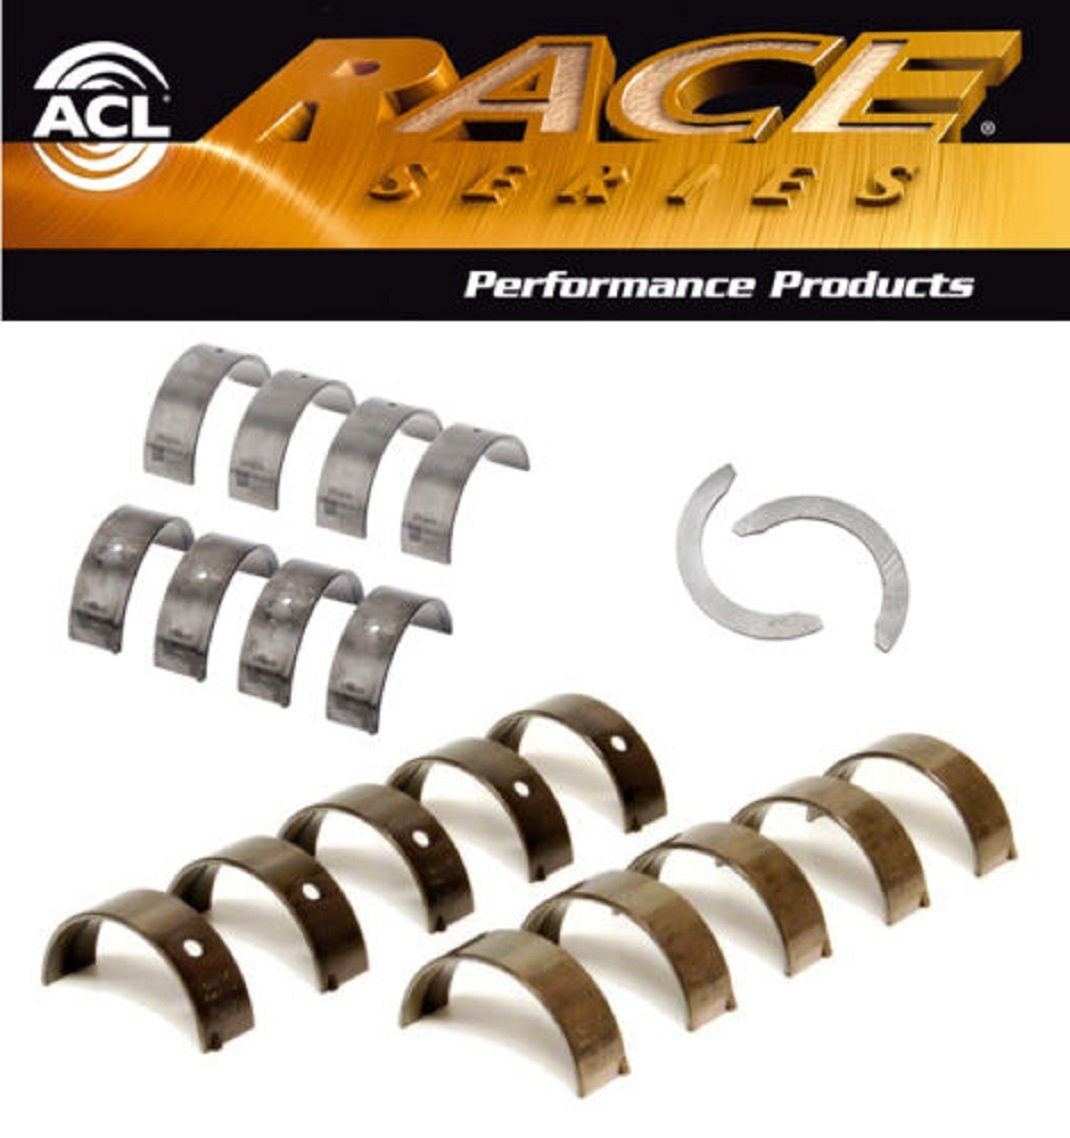 ACL Race Rod+Main Bearings+Thrust for Infiniti Nissan 200SX SR20DE SR20DET STD SR20DE 7 SR20DET